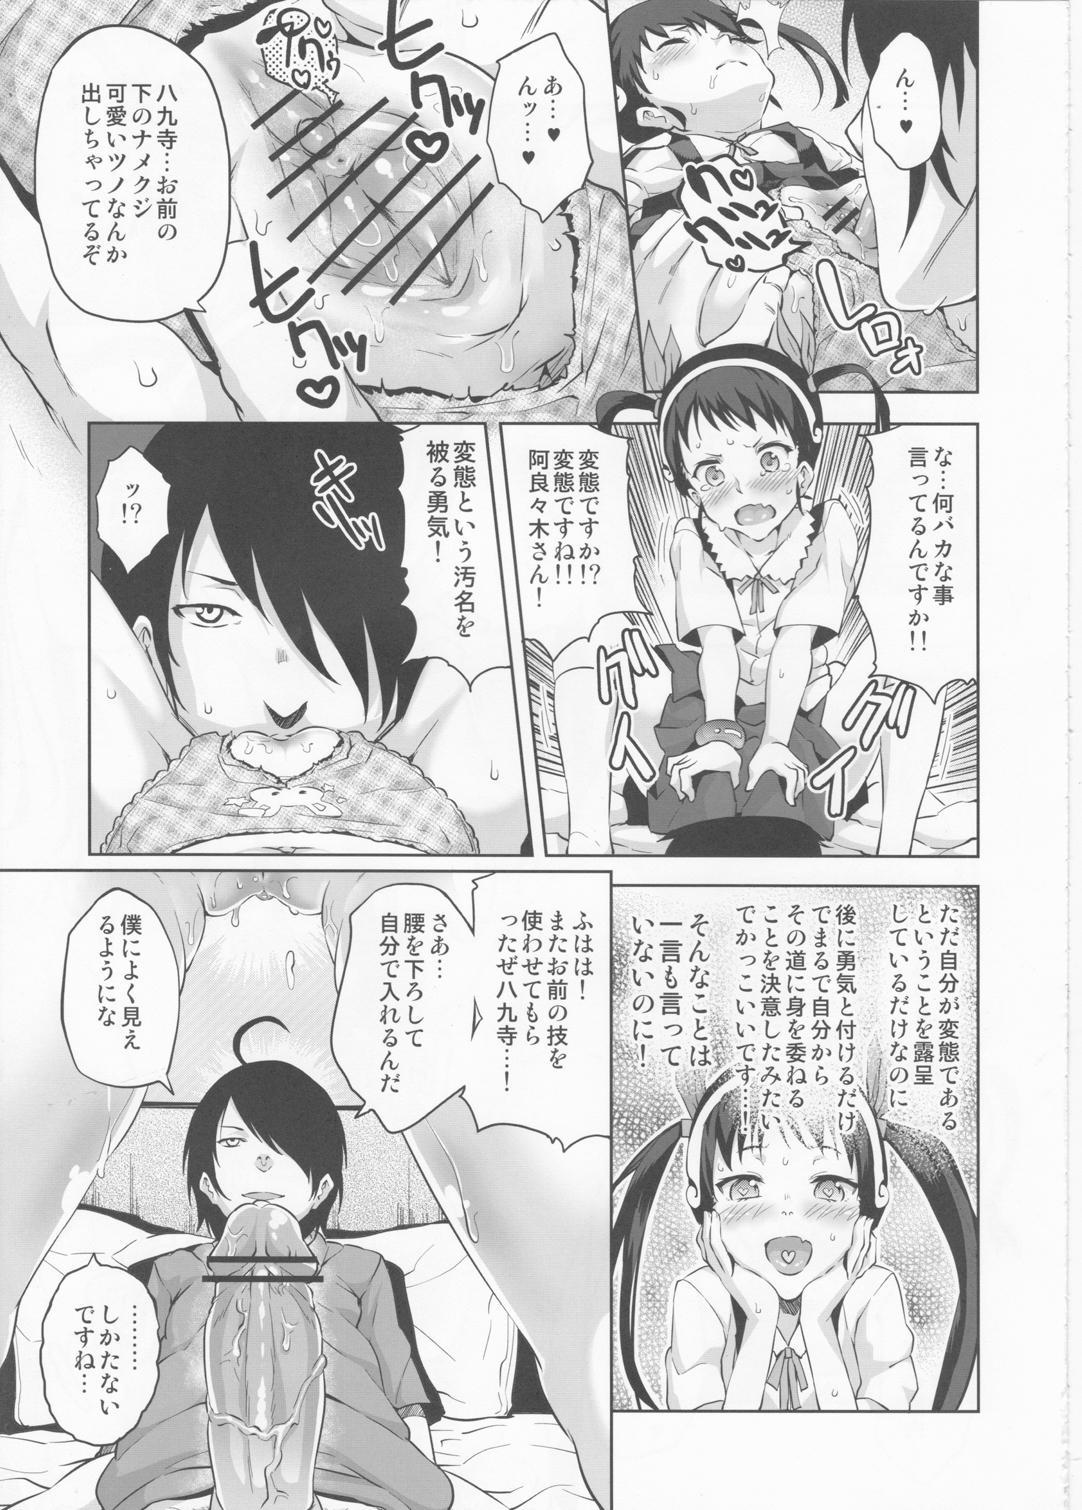 Namekuji Mayoigatari 11